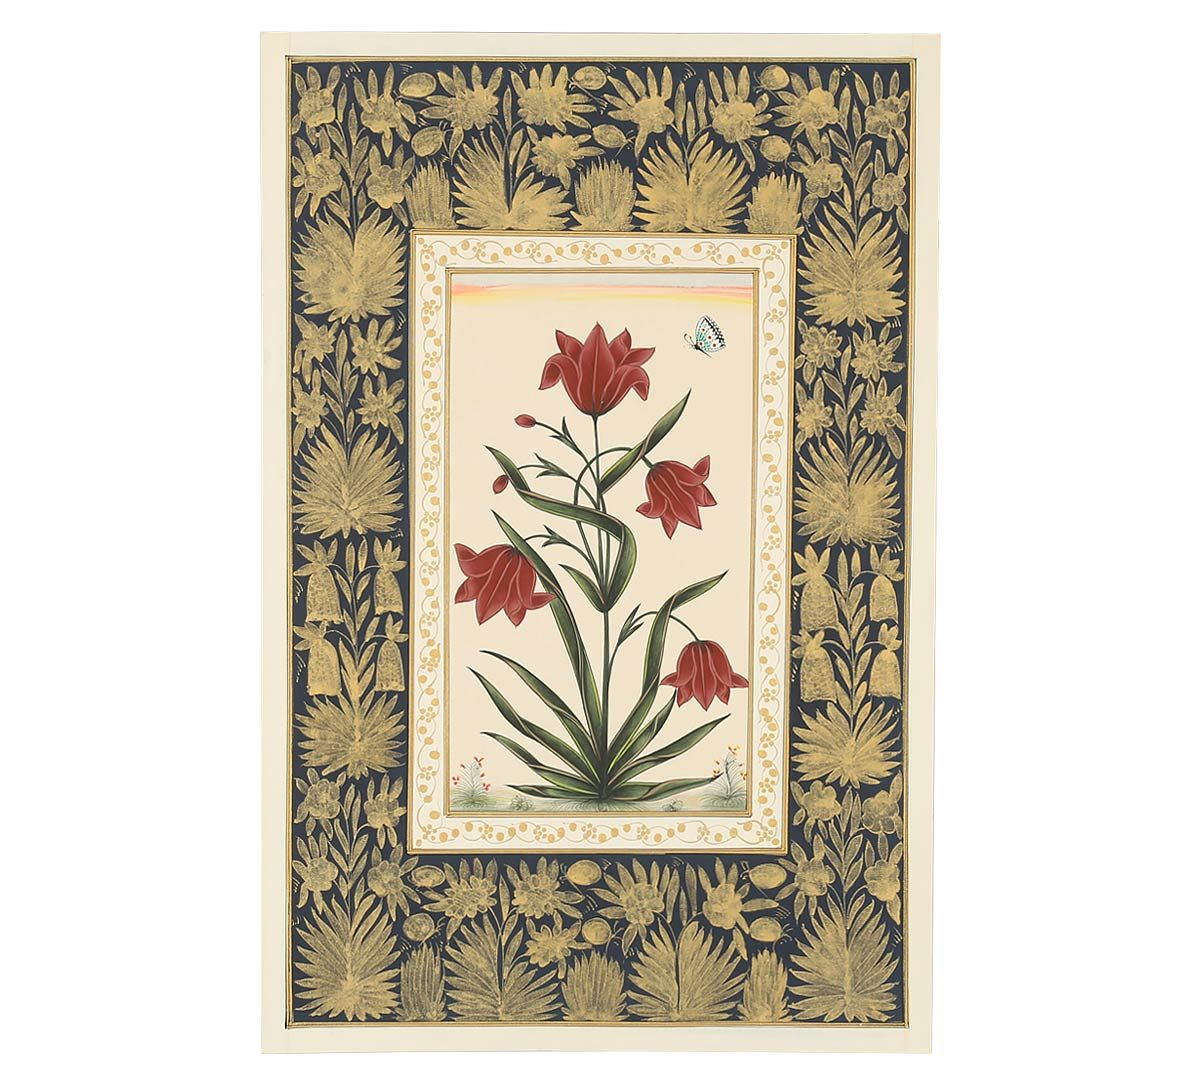 India Circus Red Tulip Handmade Poster